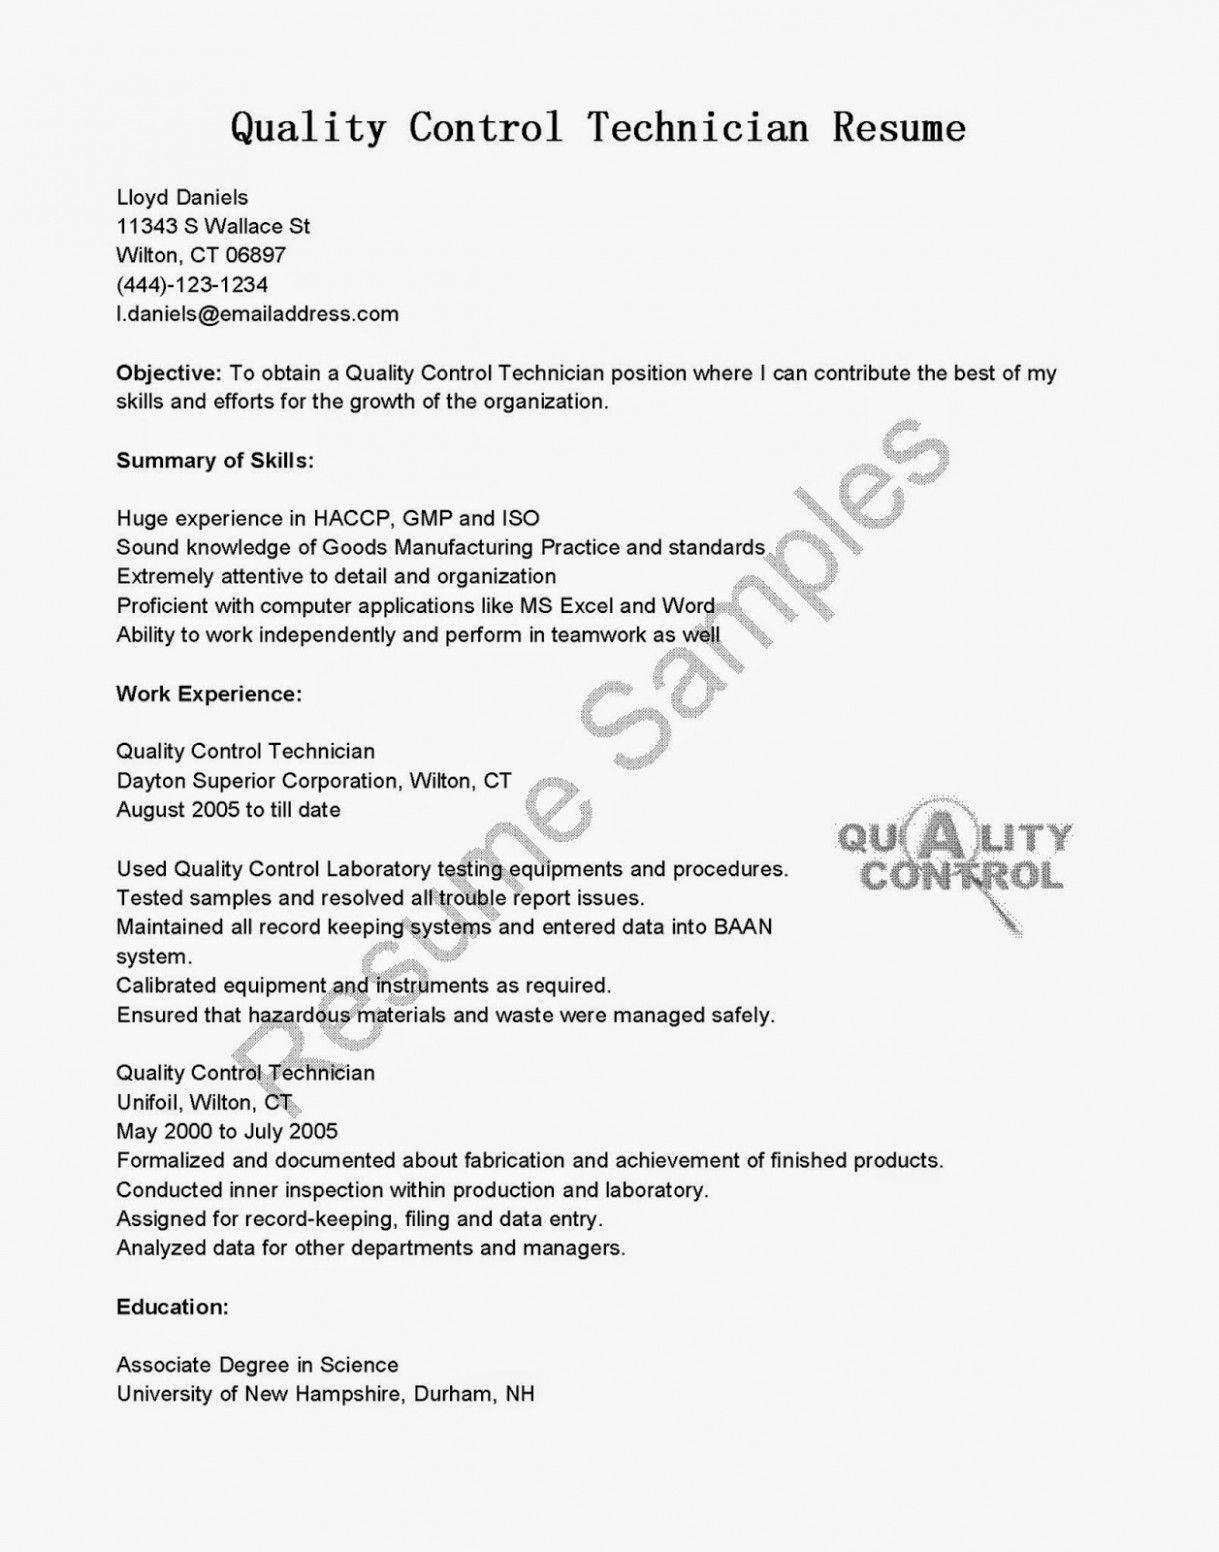 11 Ndt Degree 2 Brisker Pattern Resume